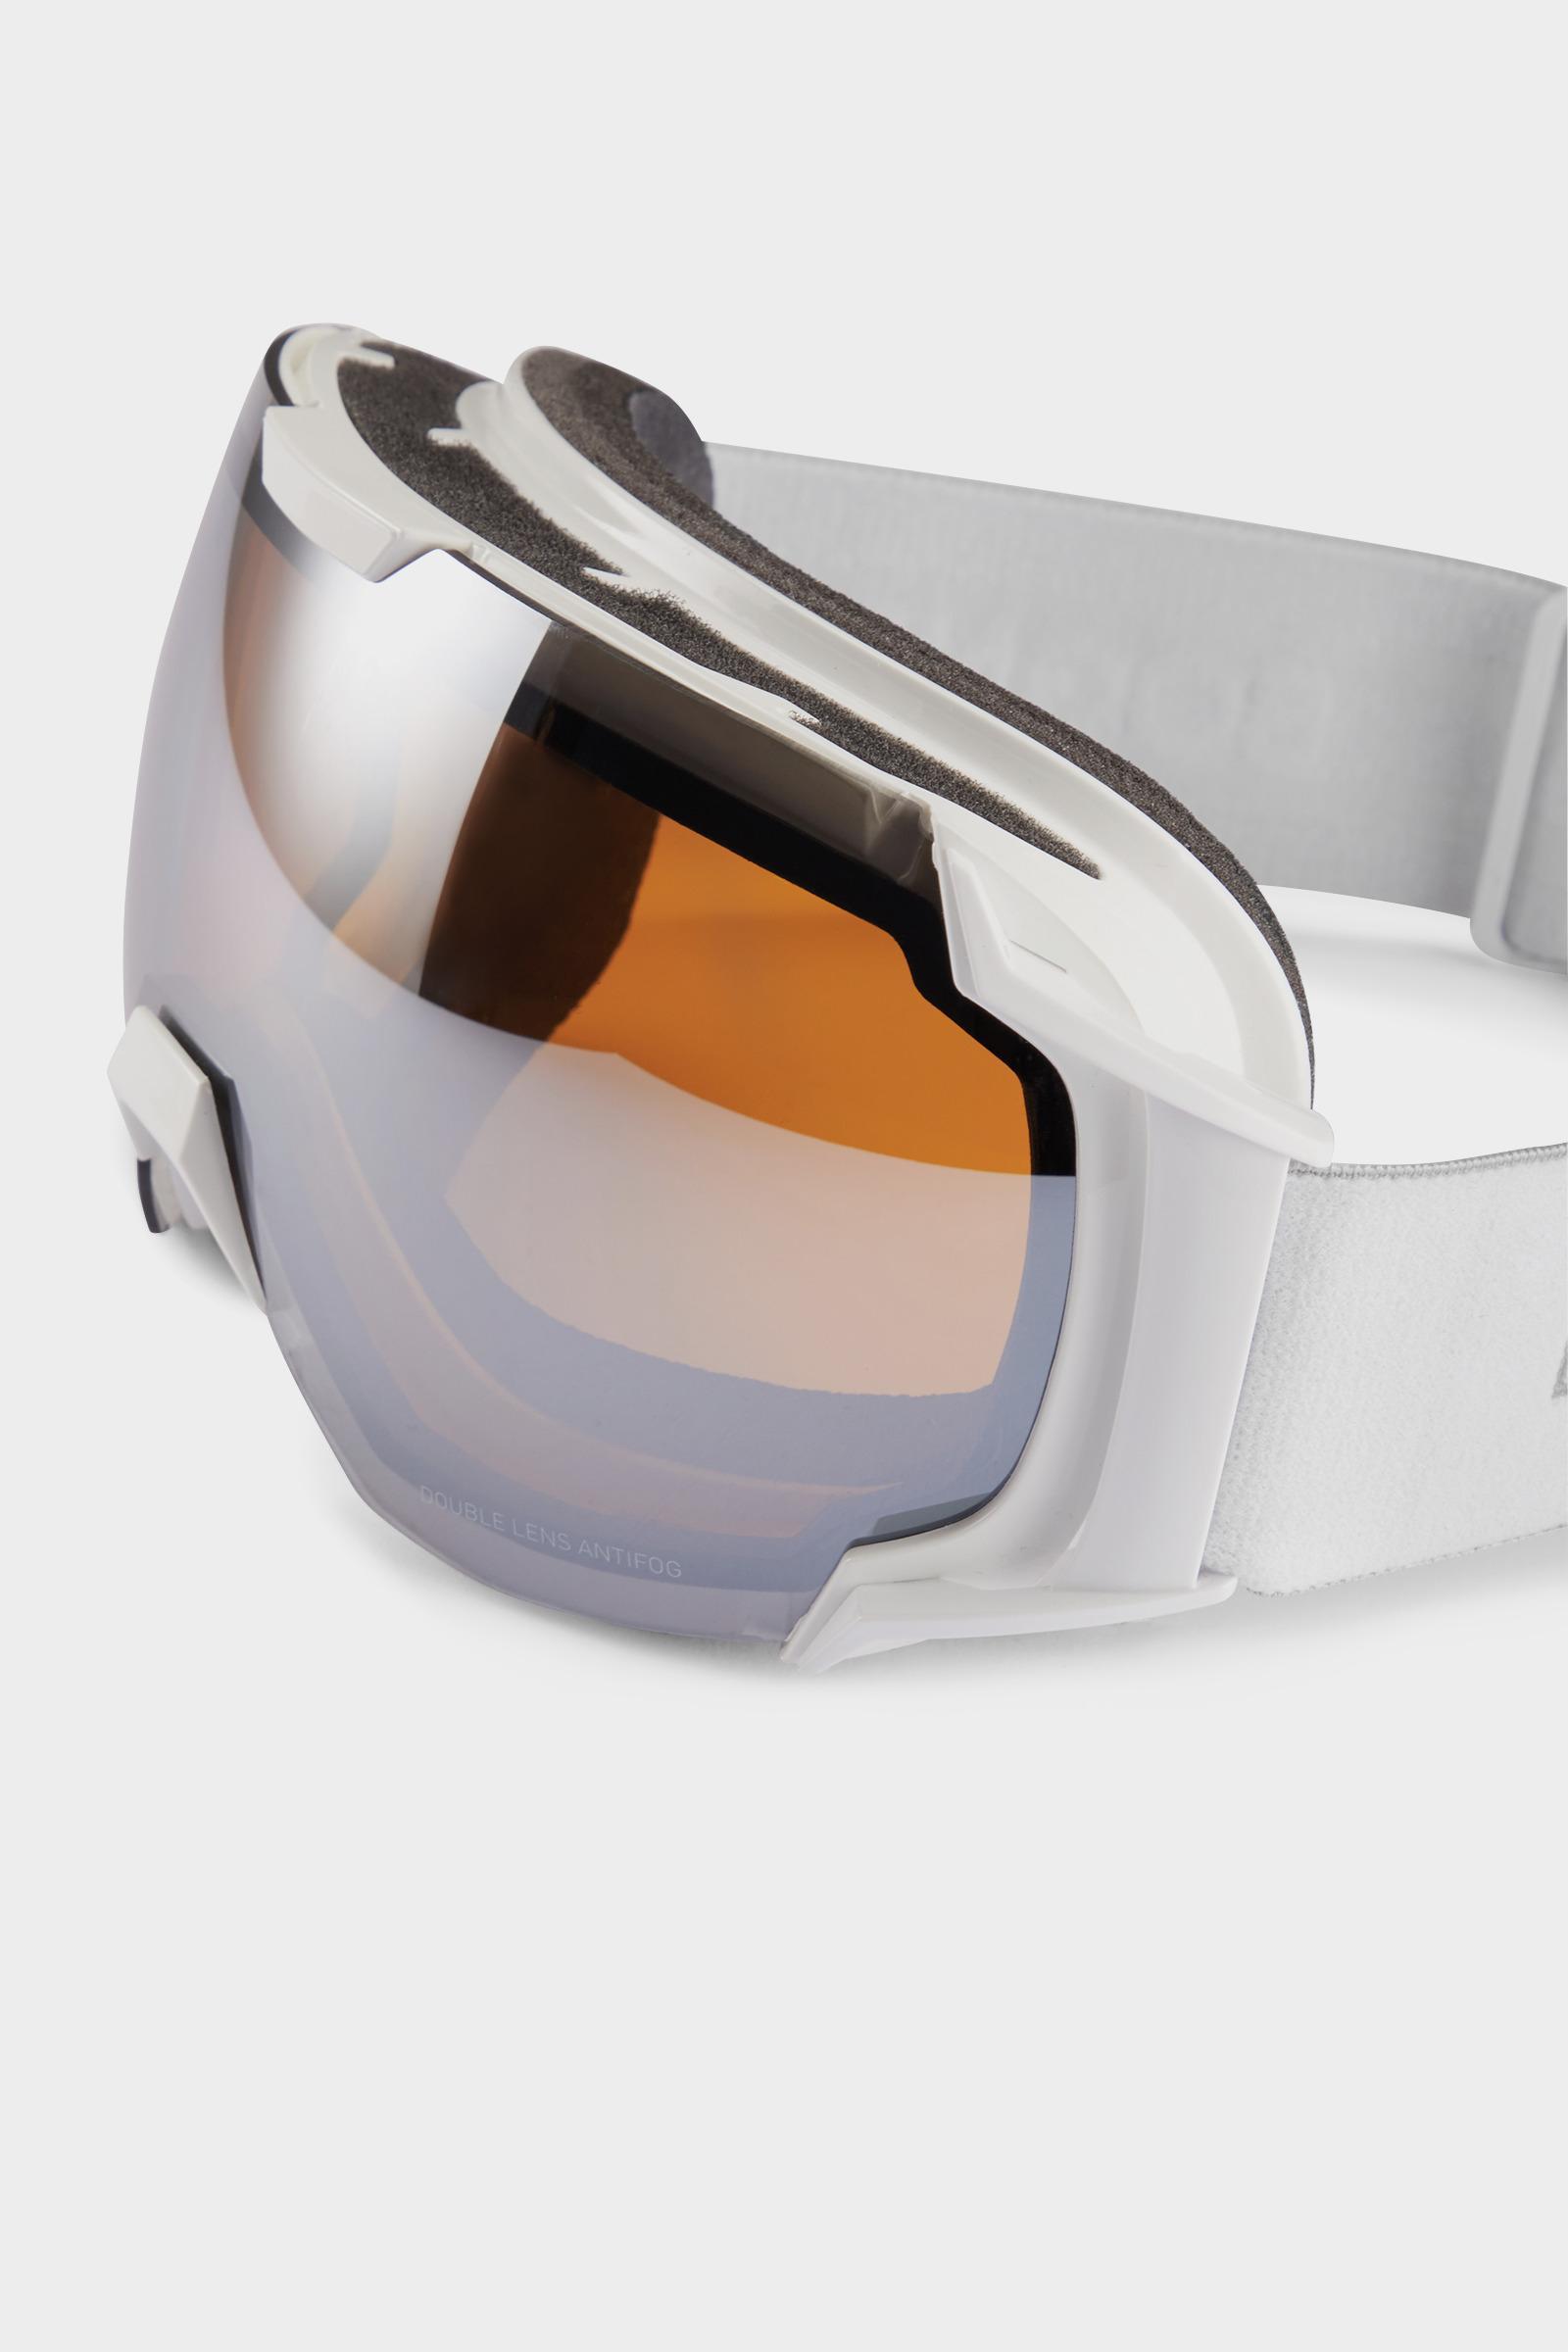 4298119cee0 Bogner Just-b Ski goggles In White in White - Save 29% - Lyst